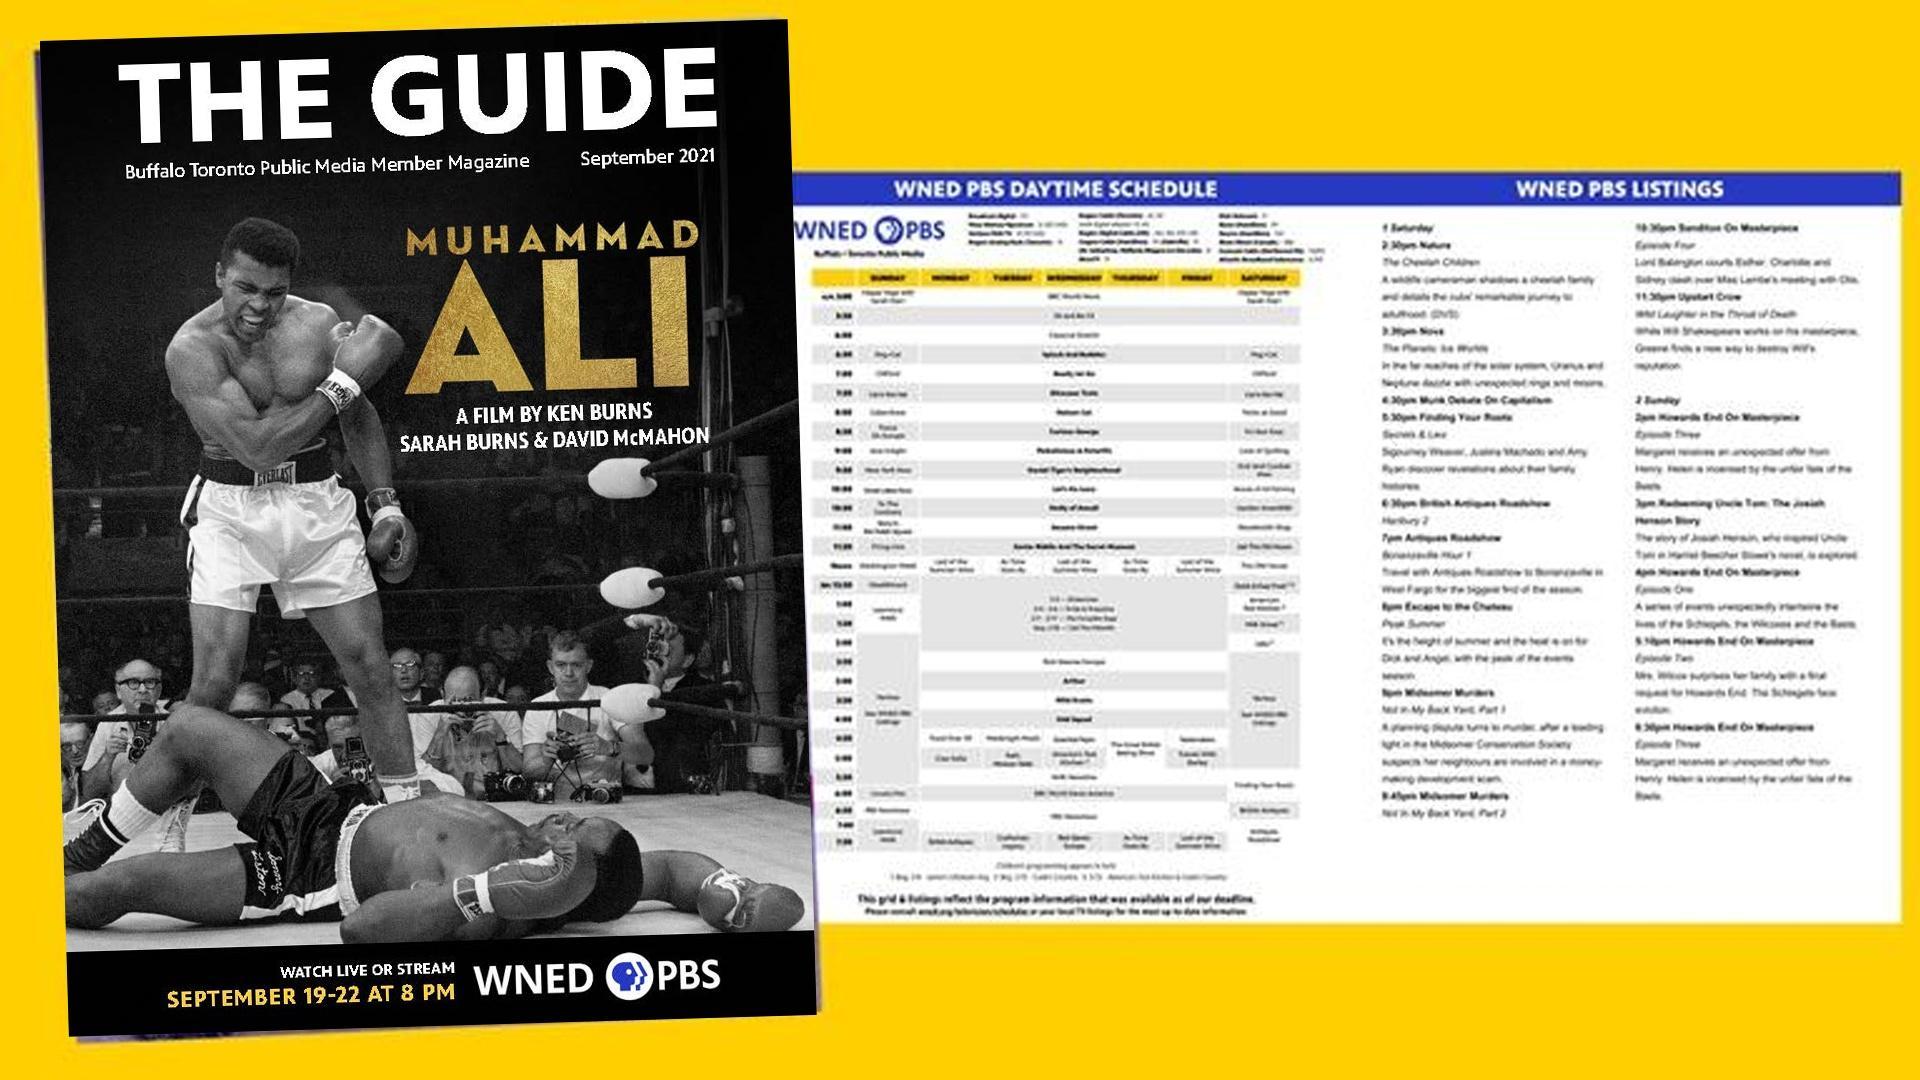 The Guide, Member Magazine